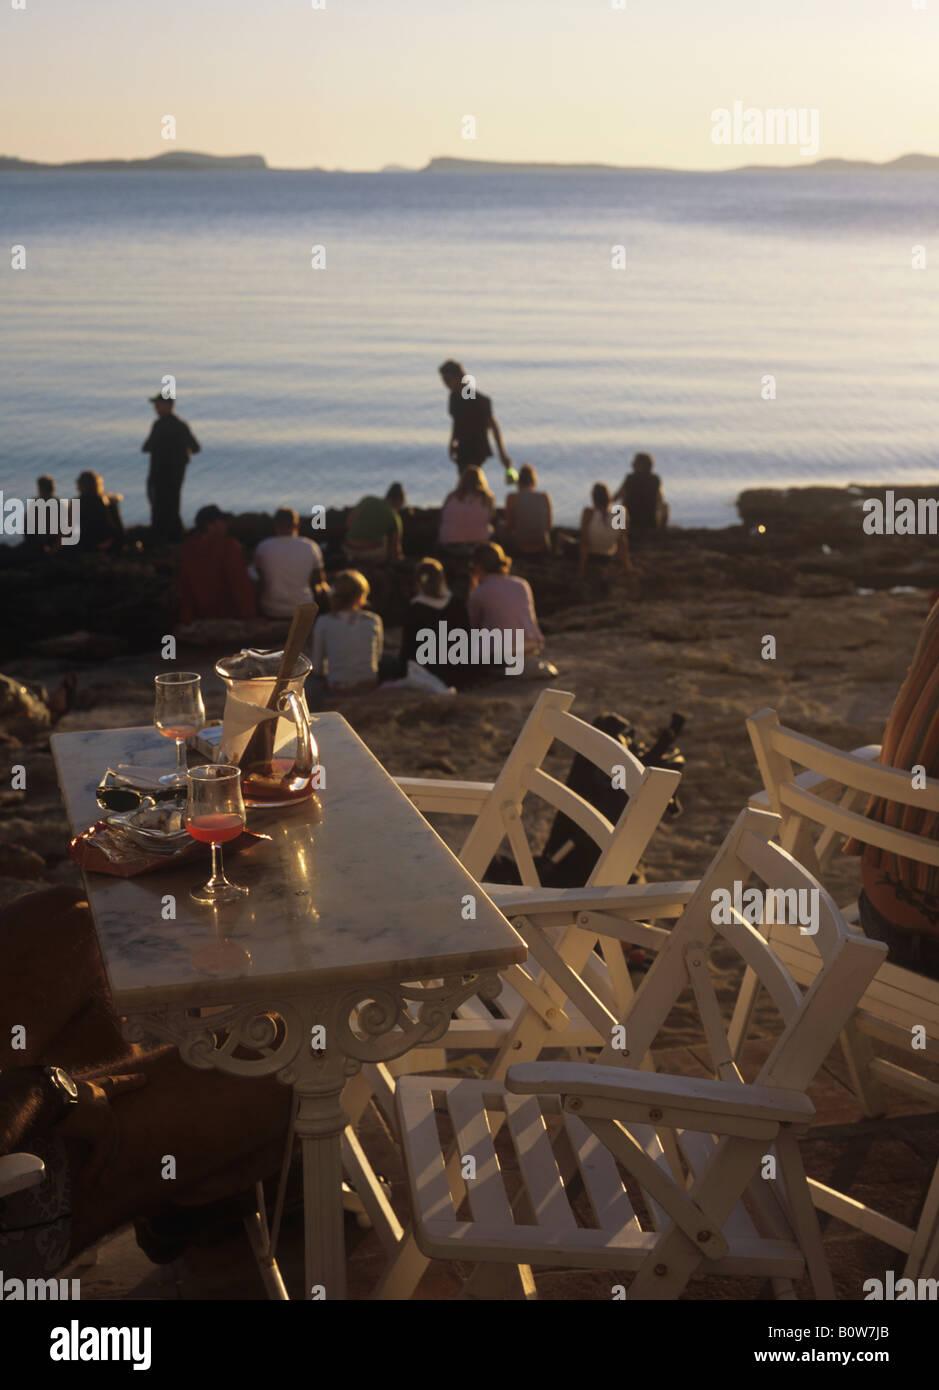 Café del Mar, Ibiza, Balearic Islands, Spain, Europe - Stock Image